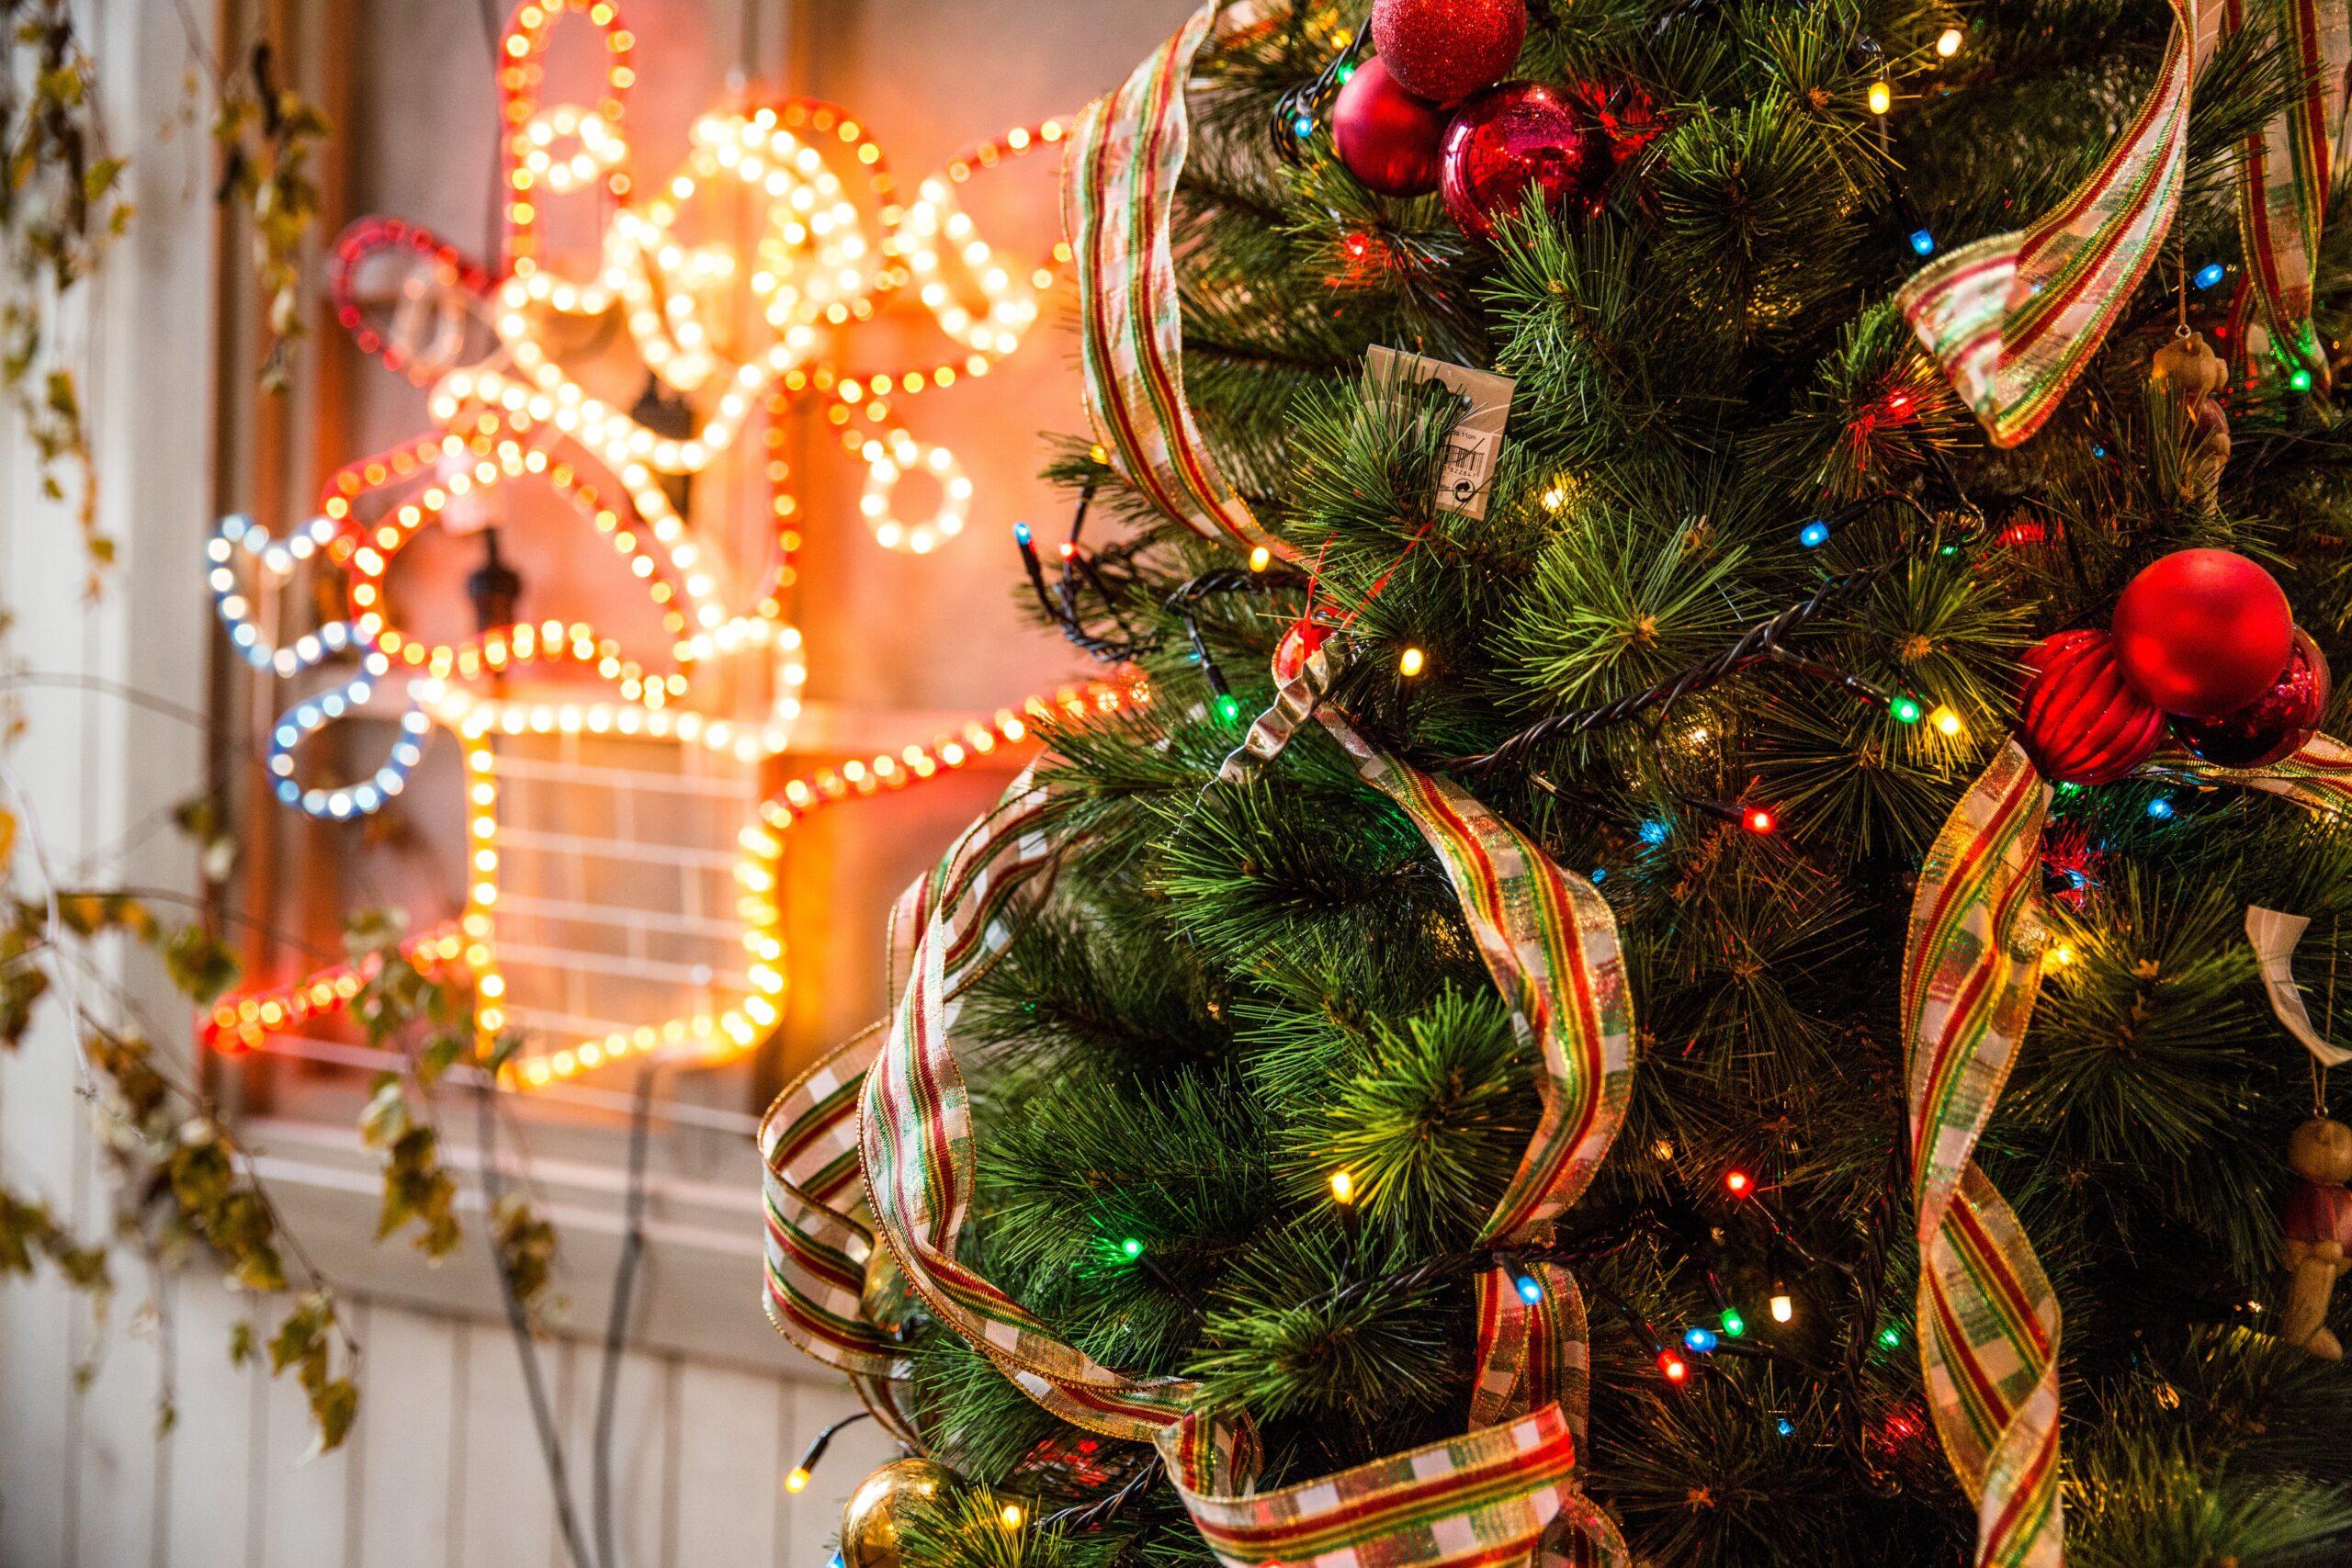 Online radiokanaal Sublime Christmas staat live!